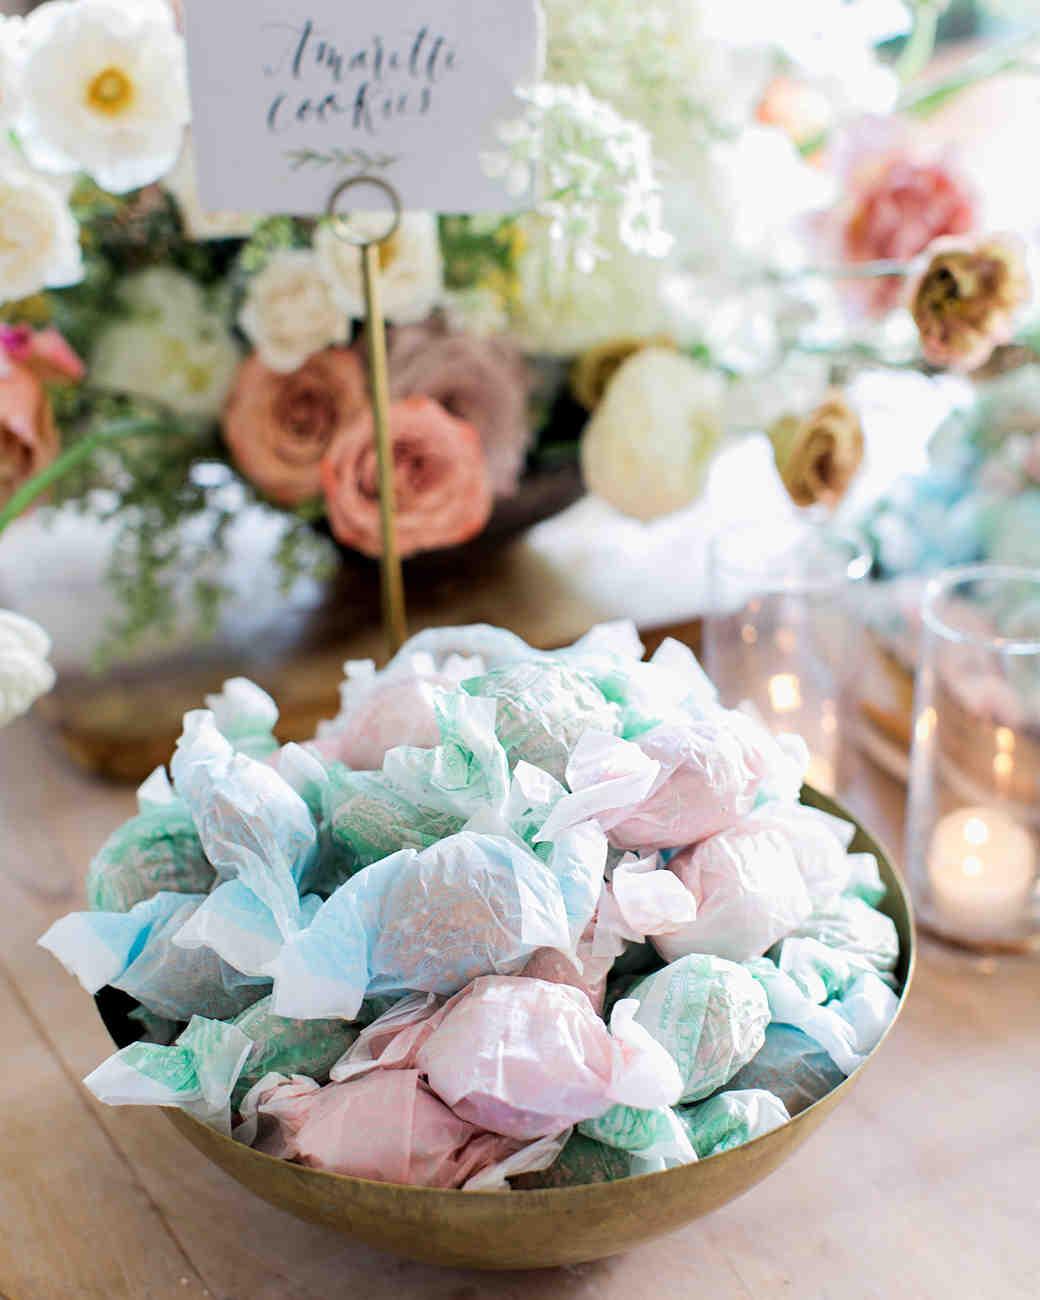 cassandra jason wedding amaretti cookies